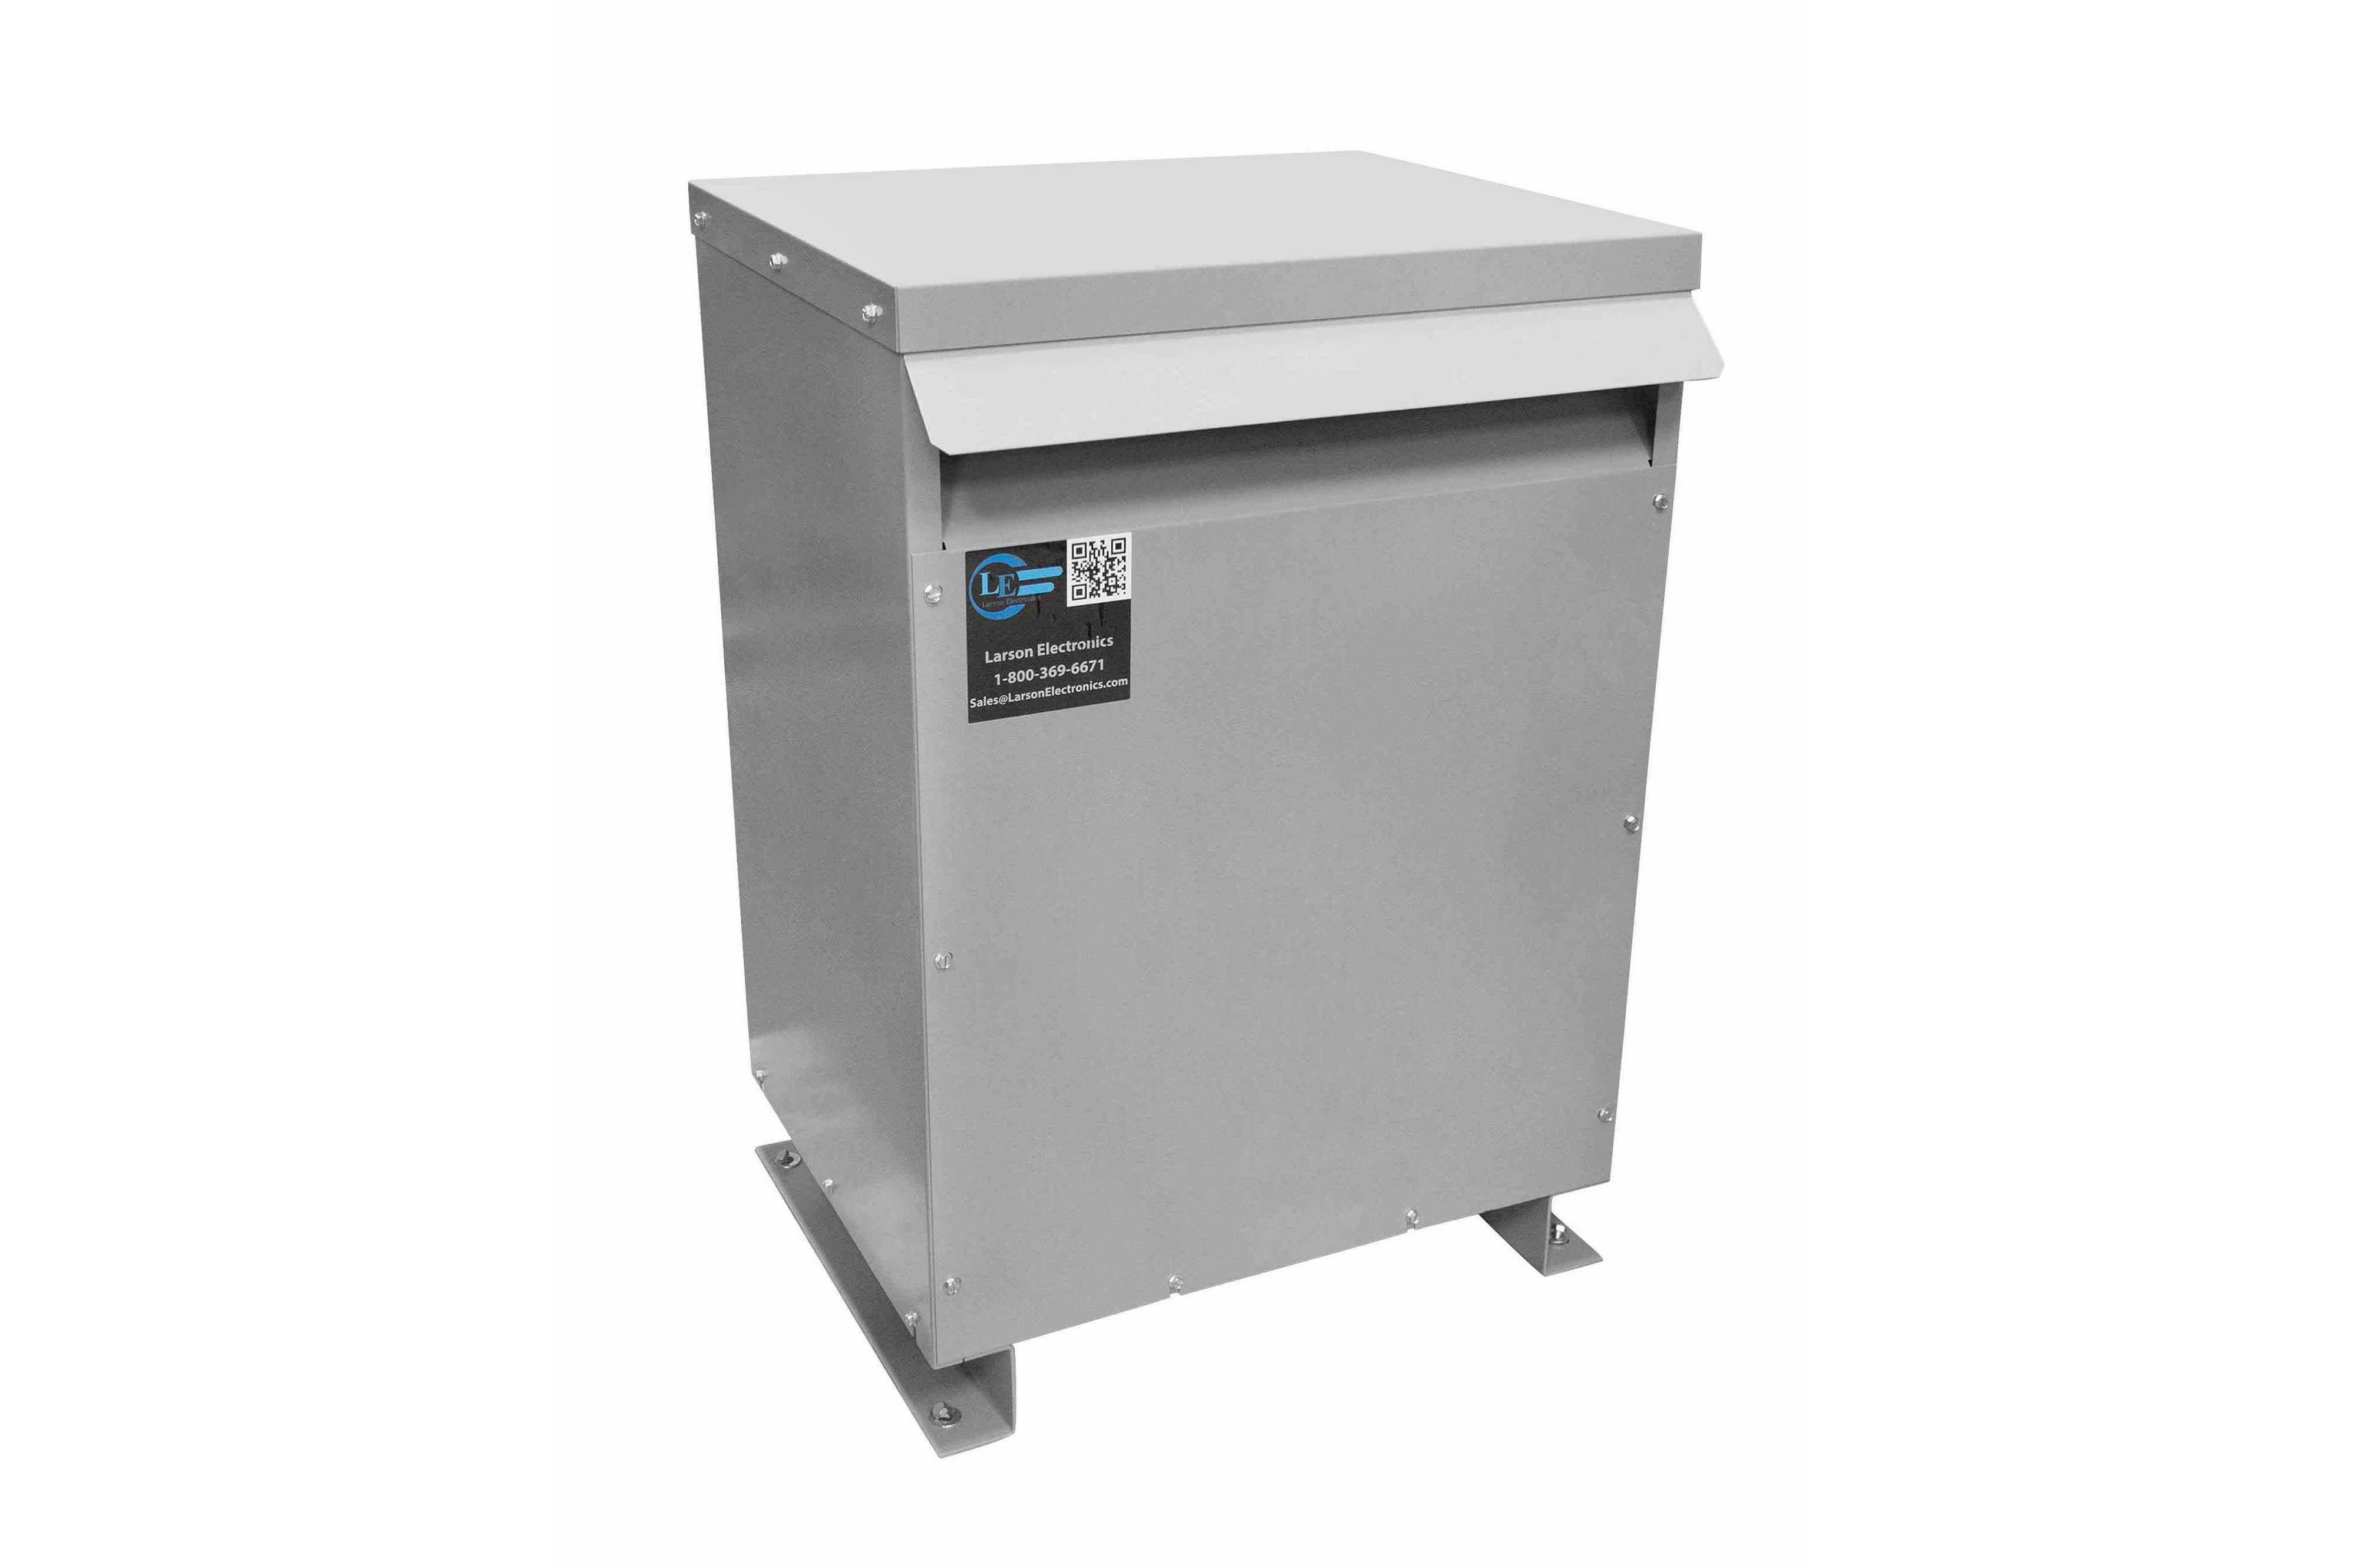 75 kVA 3PH Isolation Transformer, 460V Wye Primary, 208Y/120 Wye-N Secondary, N3R, Ventilated, 60 Hz